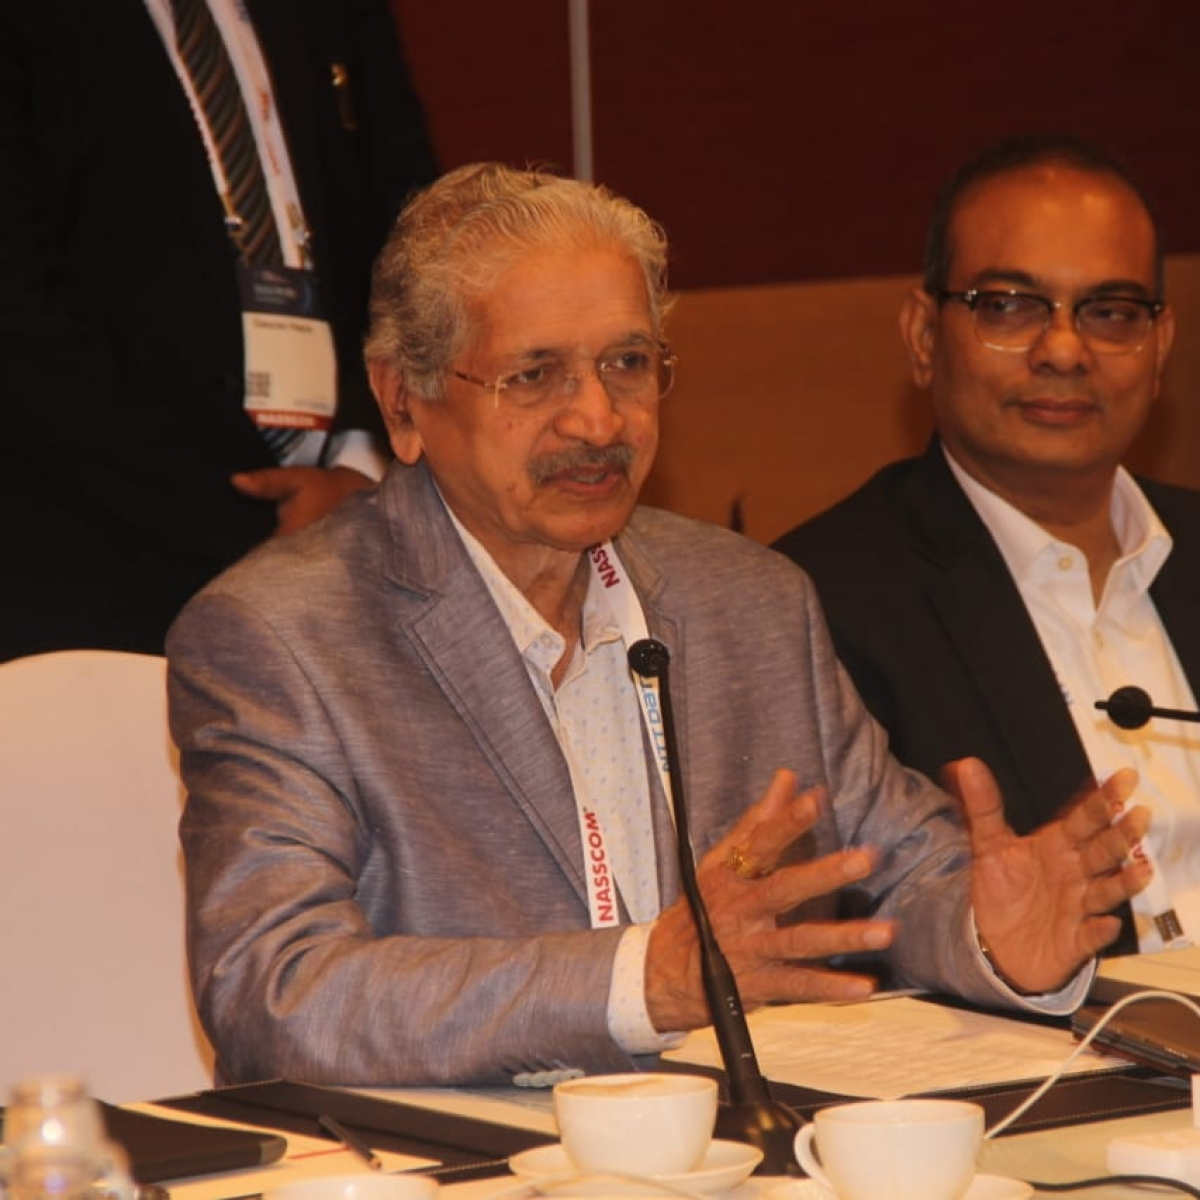 Shiv Sena's Subhash Desai dismisses reports of Sena-BJP reunion in Maharashtra